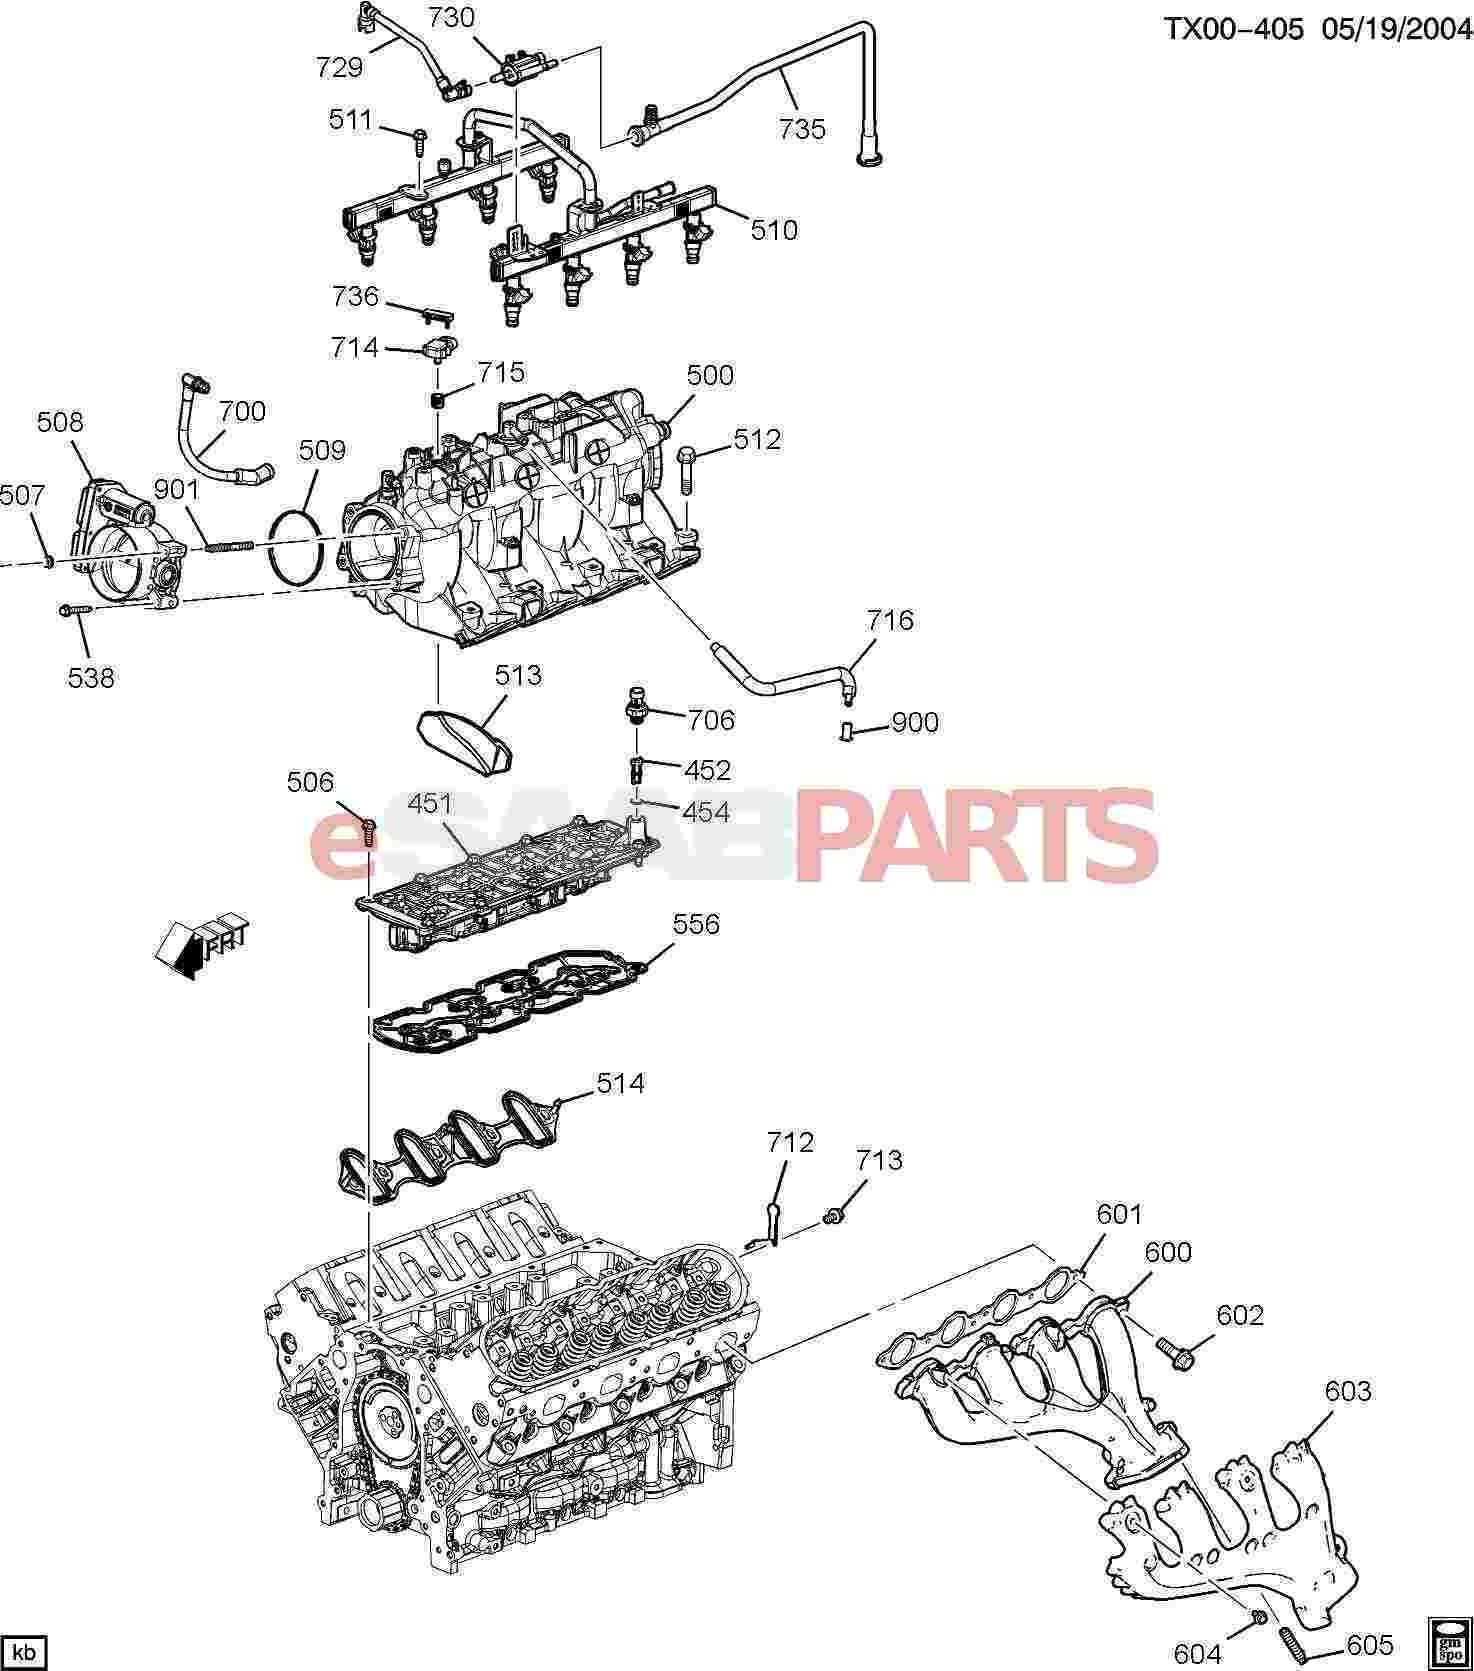 2001 blazer engine diagram 1997 chevy s10 wiring diagram